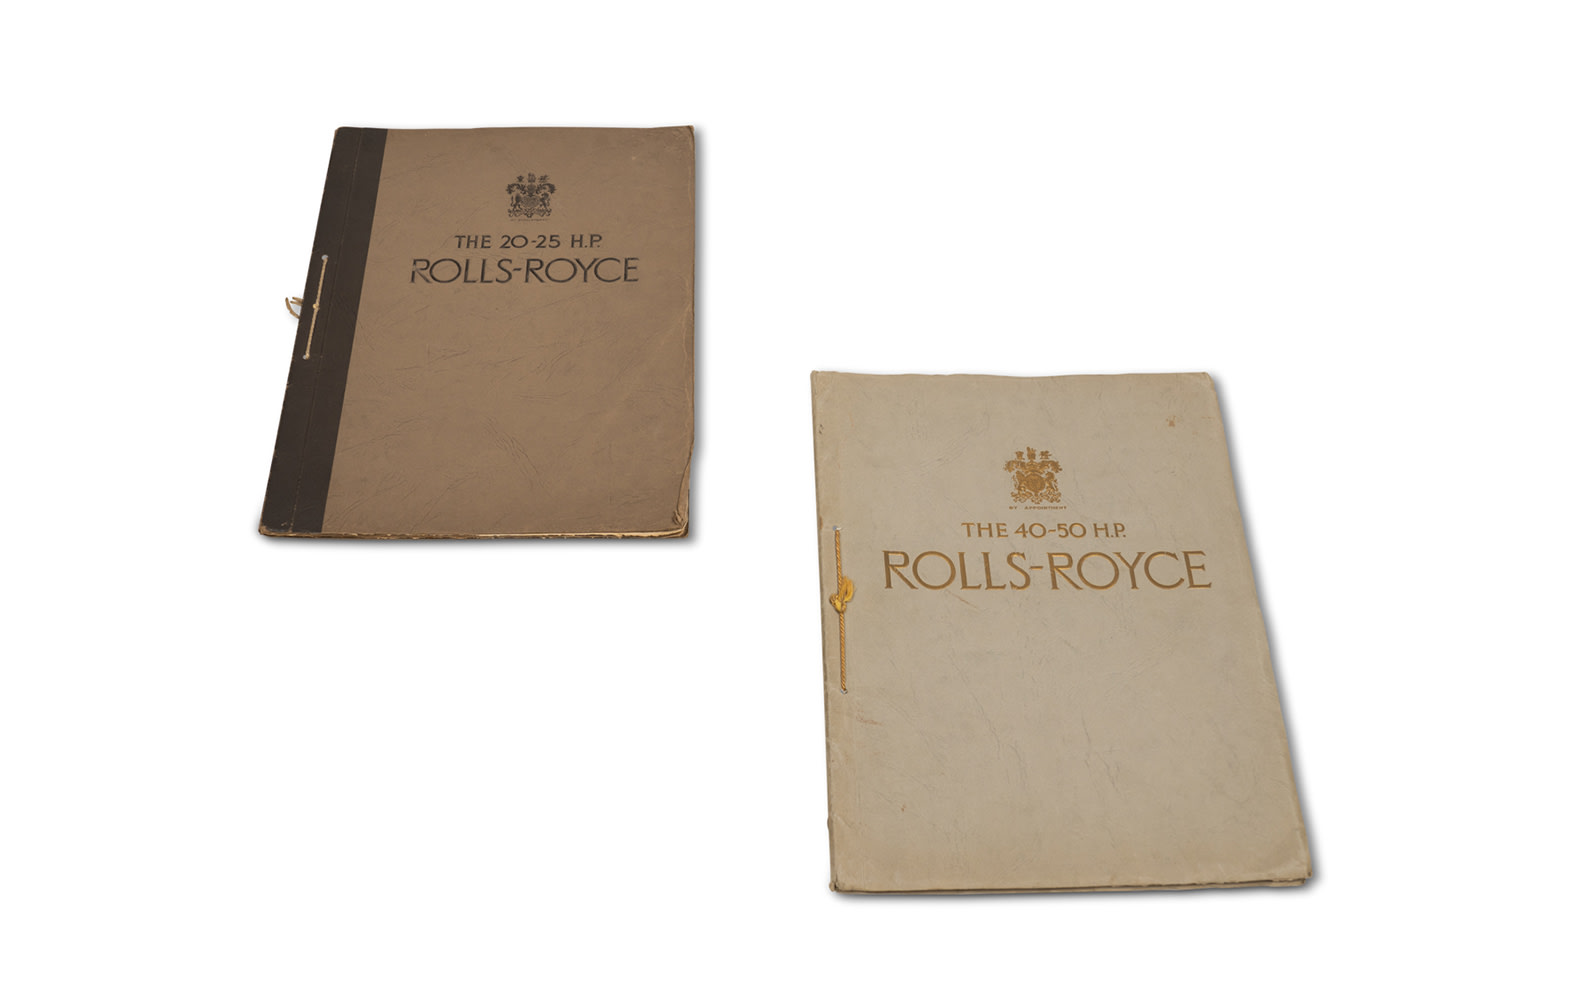 Rolls-Royce Sales Brochures for Phantom II and 20/25 Models